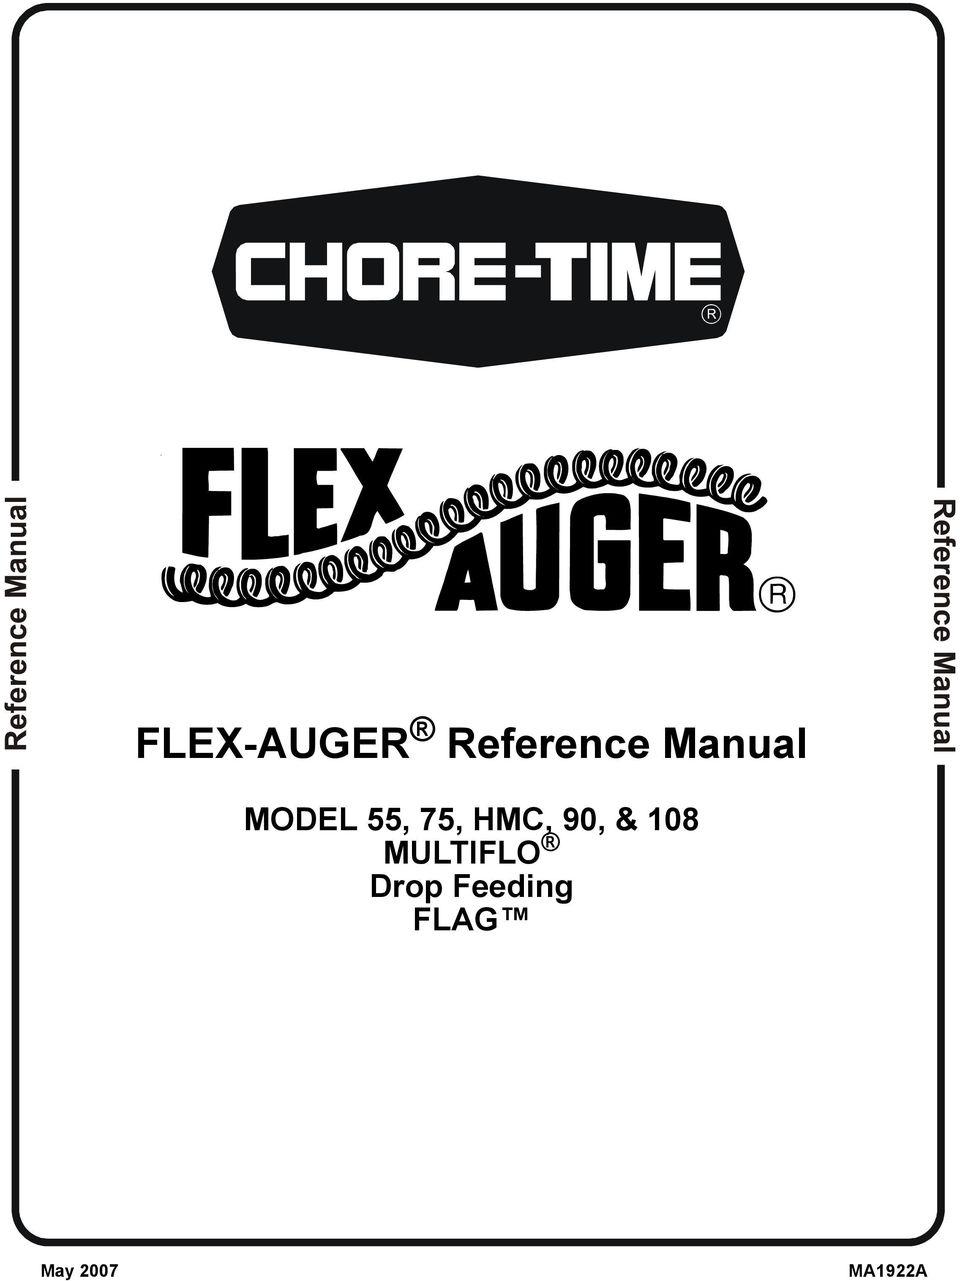 FLEX-AUGER Reference Manual. MODEL 55, 75, HMC, 90, & 108